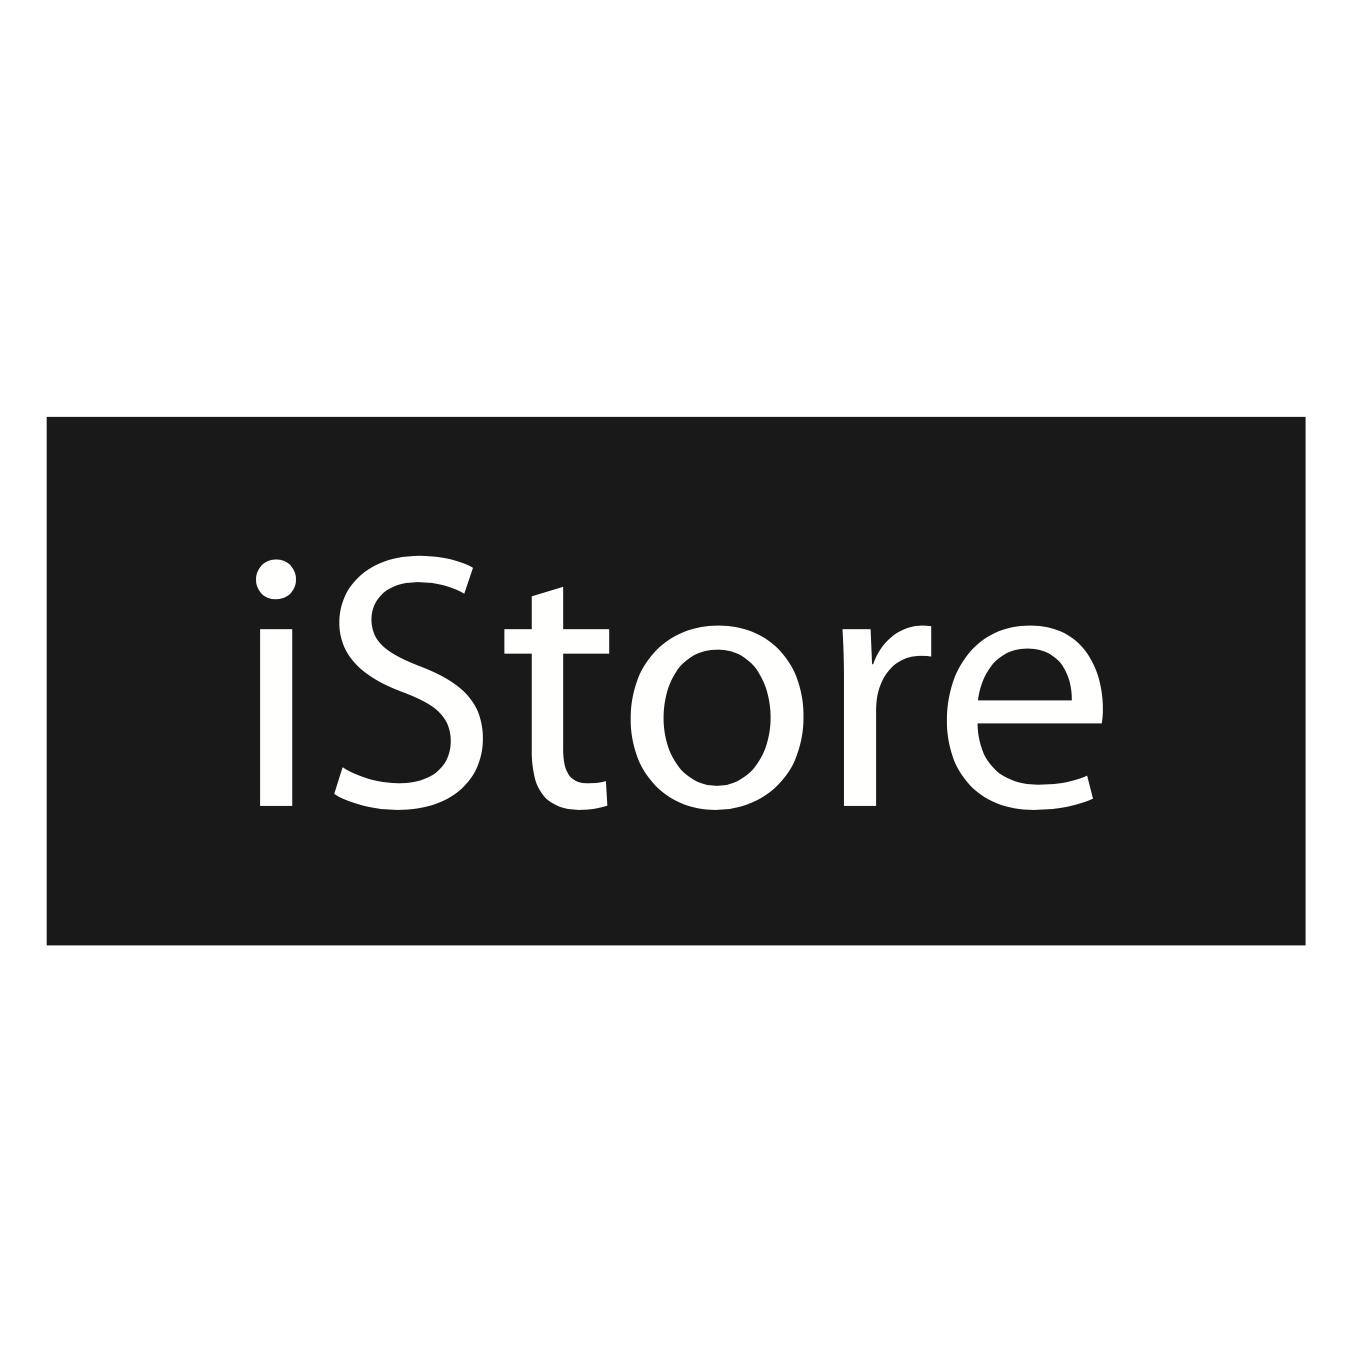 Karat Case for iPhone 6 / 6s - Rose Gold